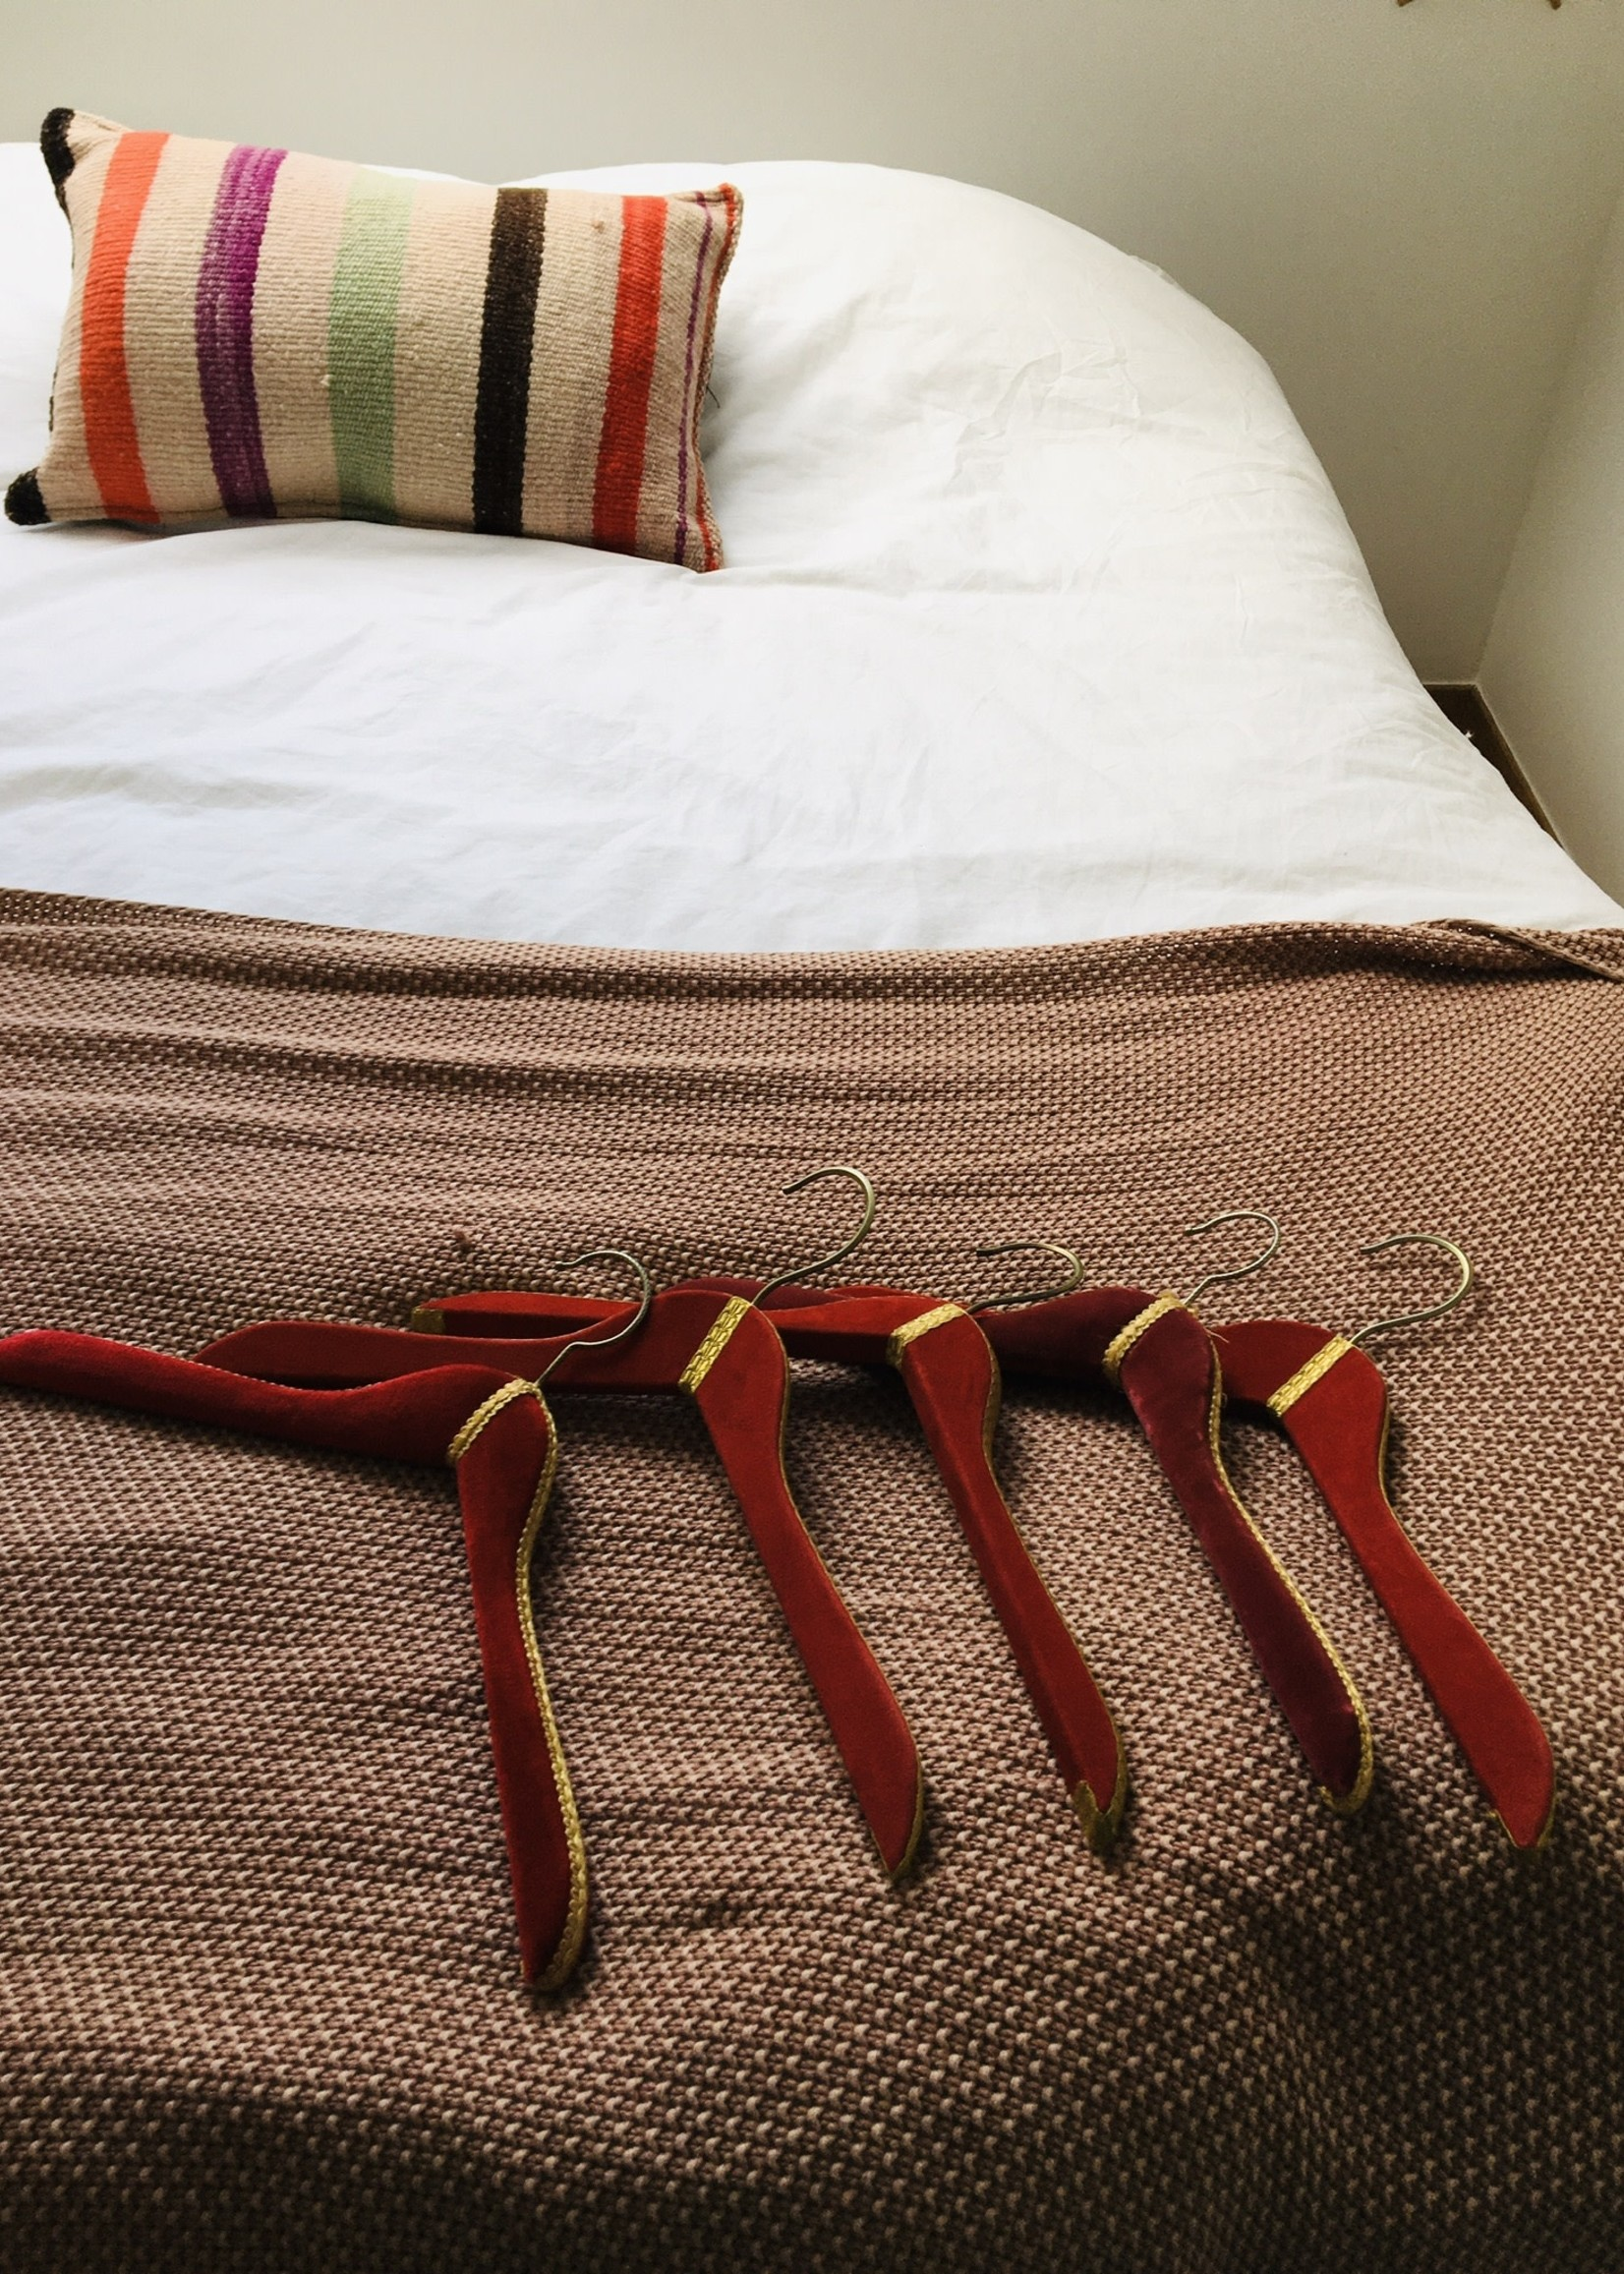 Red, pink and gold vintage velvet hangers